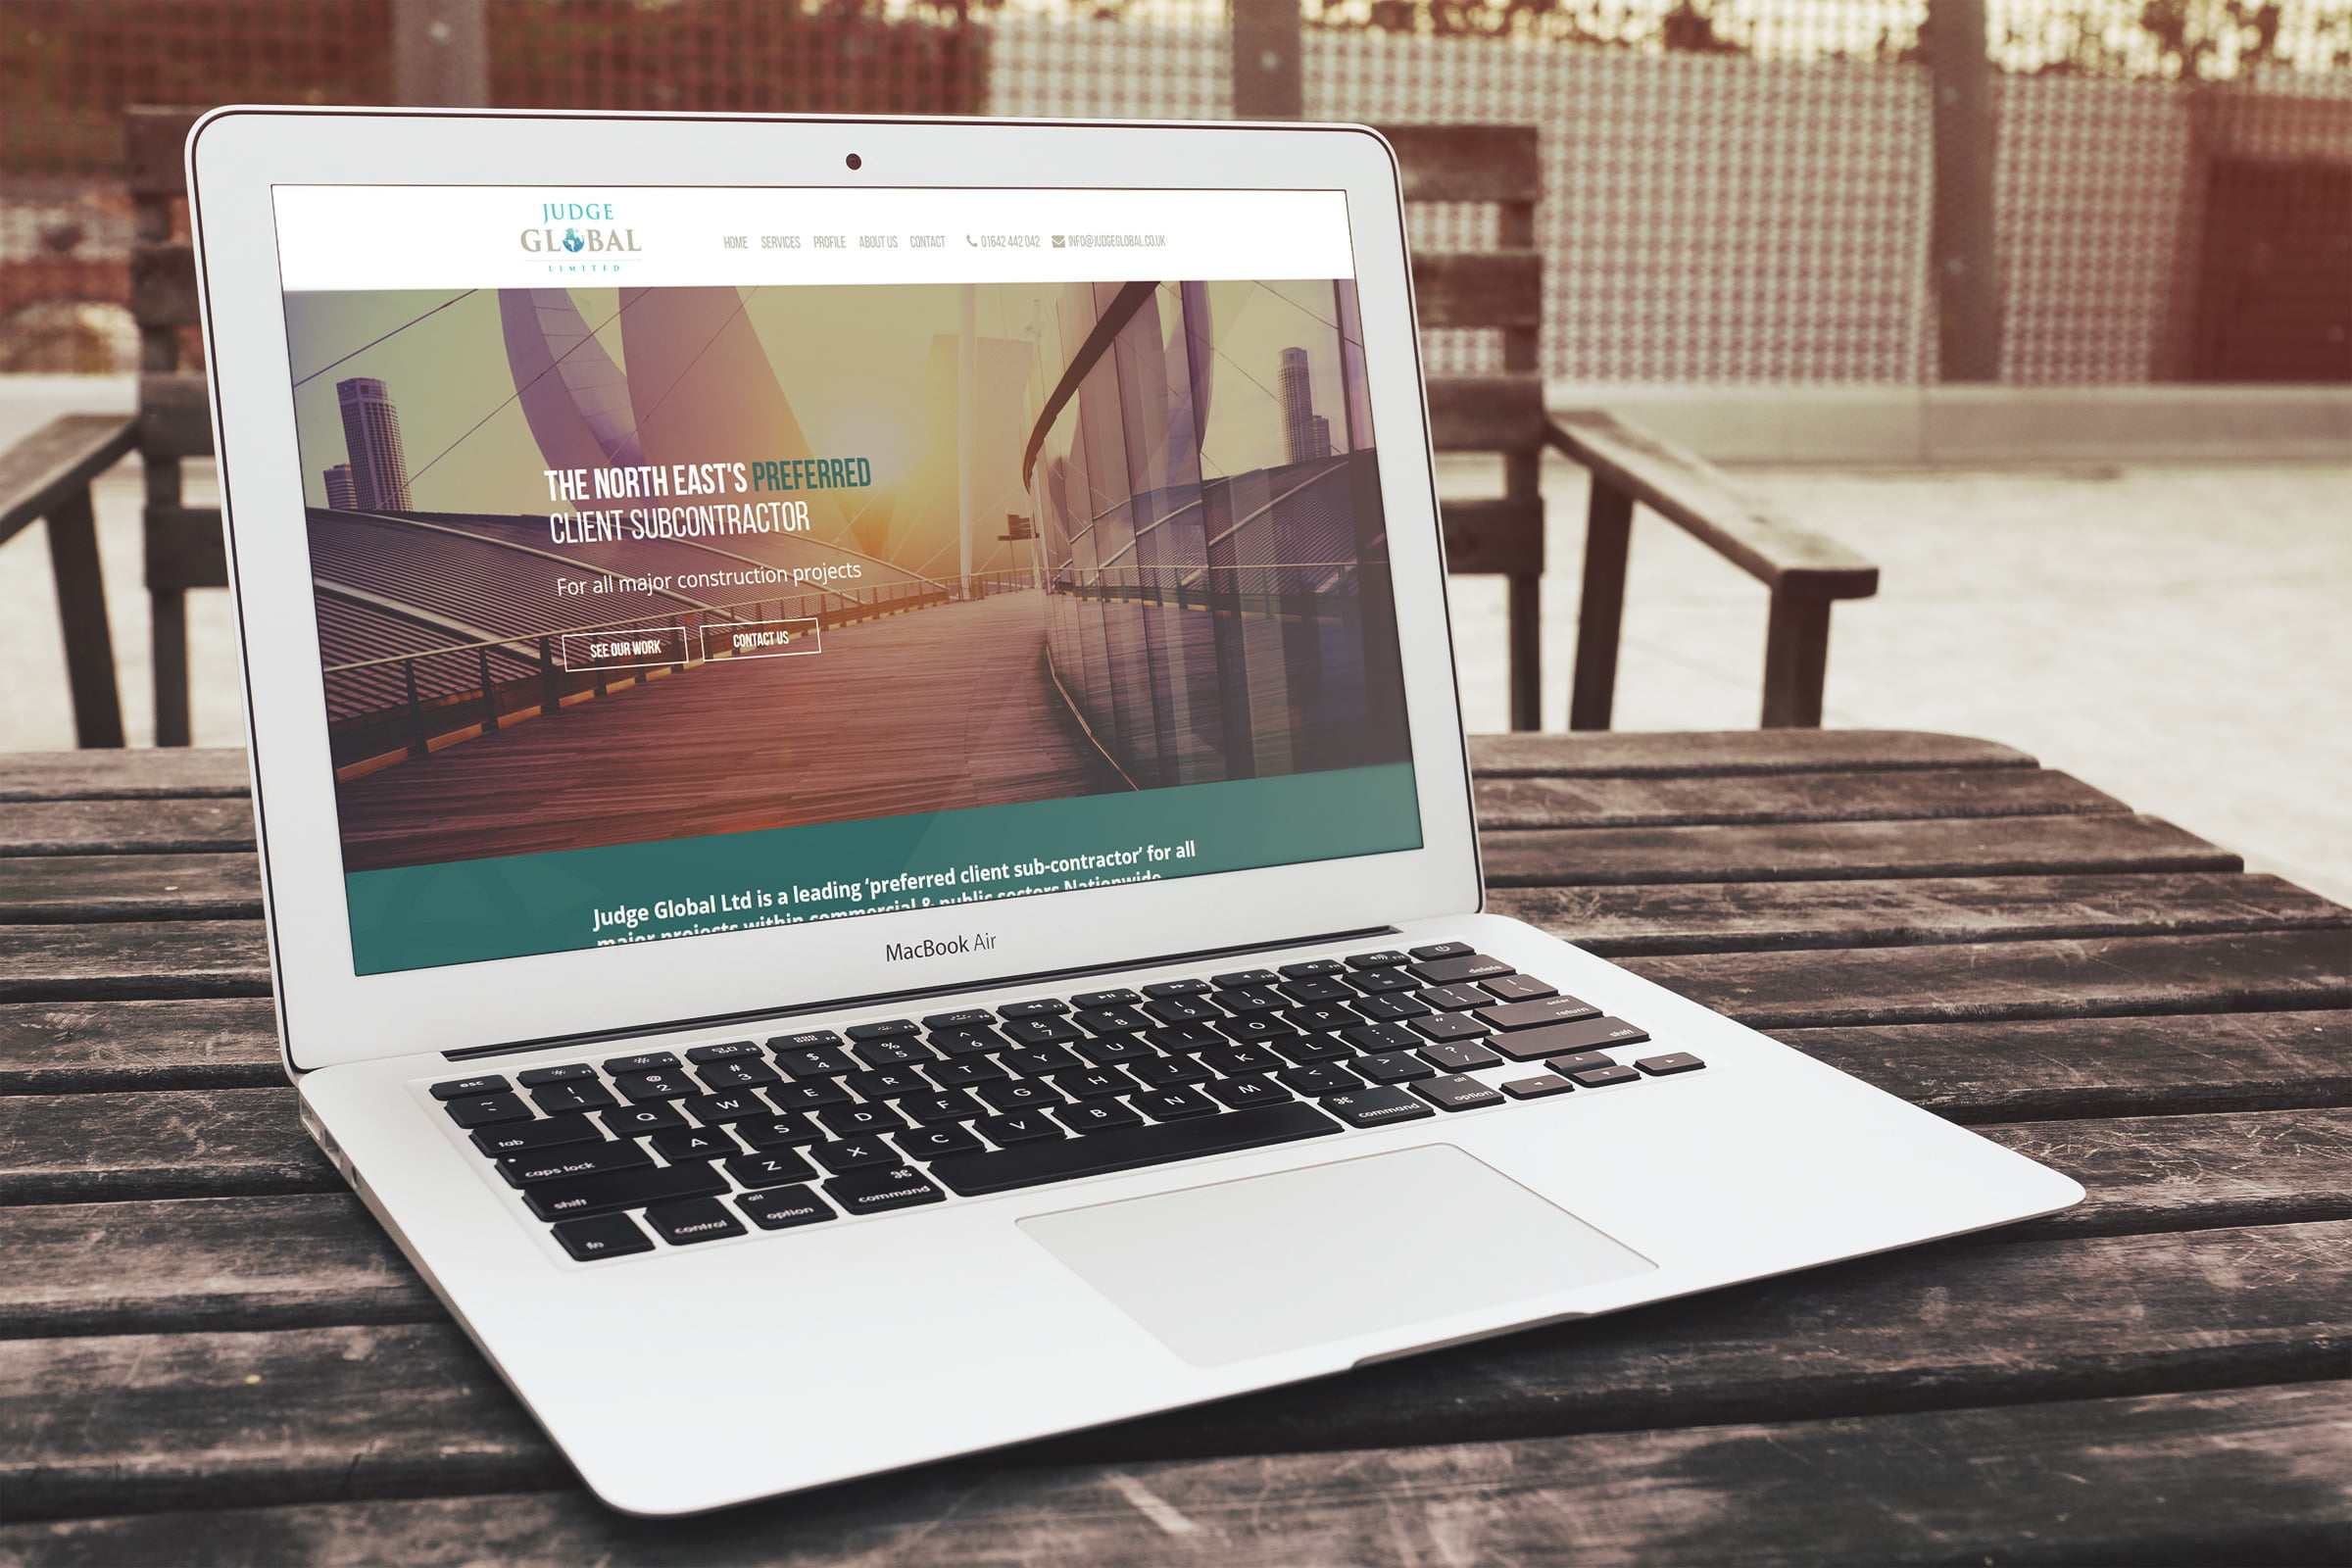 Judge Global website displayed on laptop